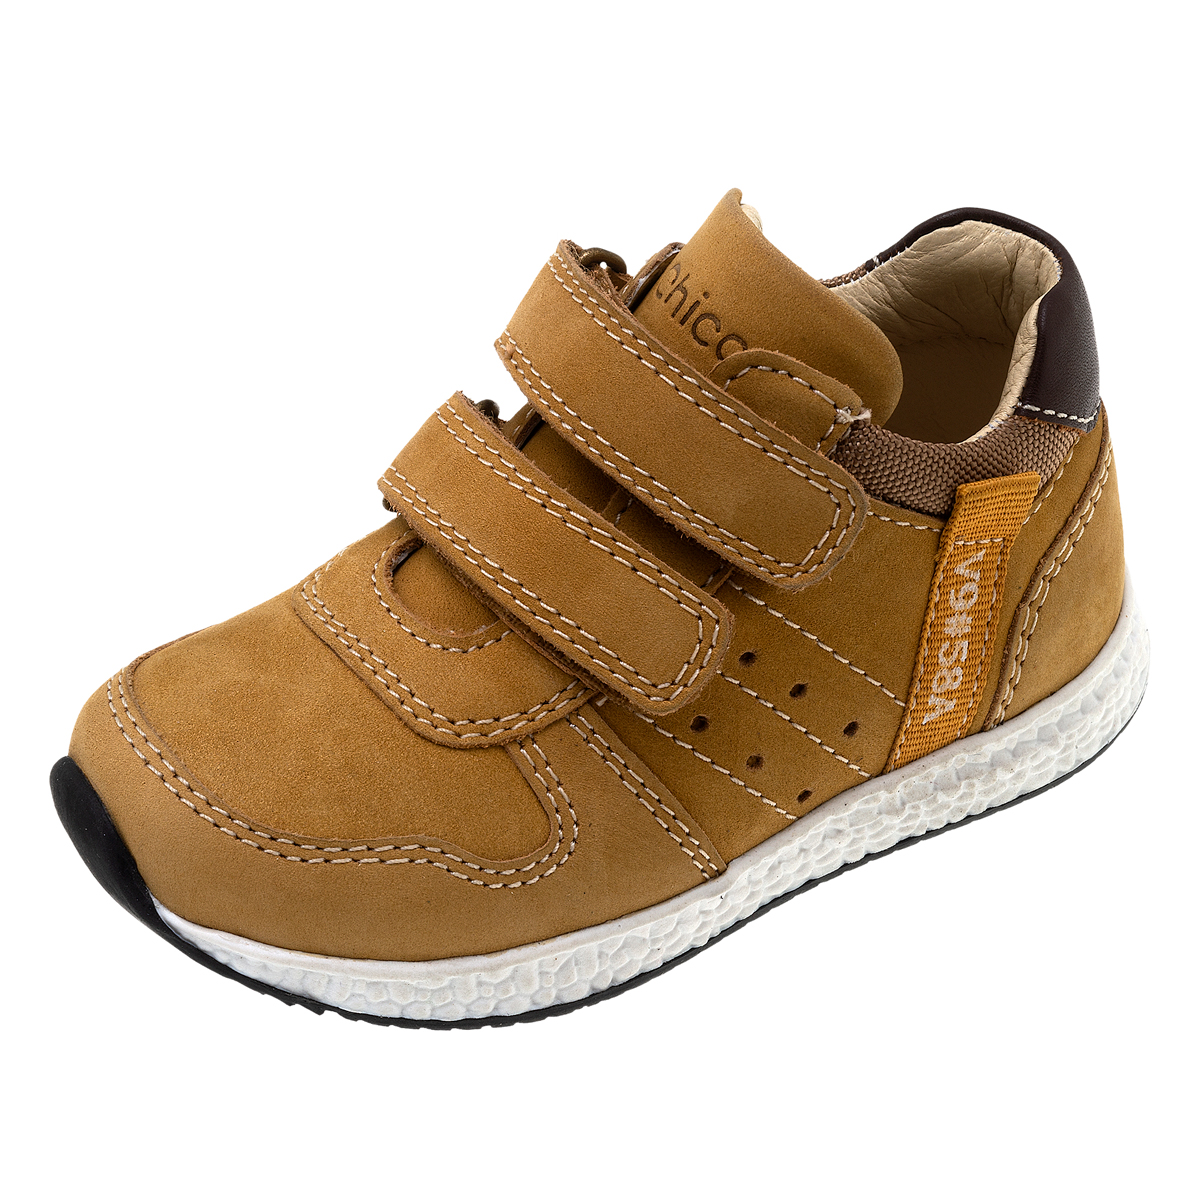 Pantofi Sport Copii Chicco Clisol, Piele Naturala, 62584 imagine